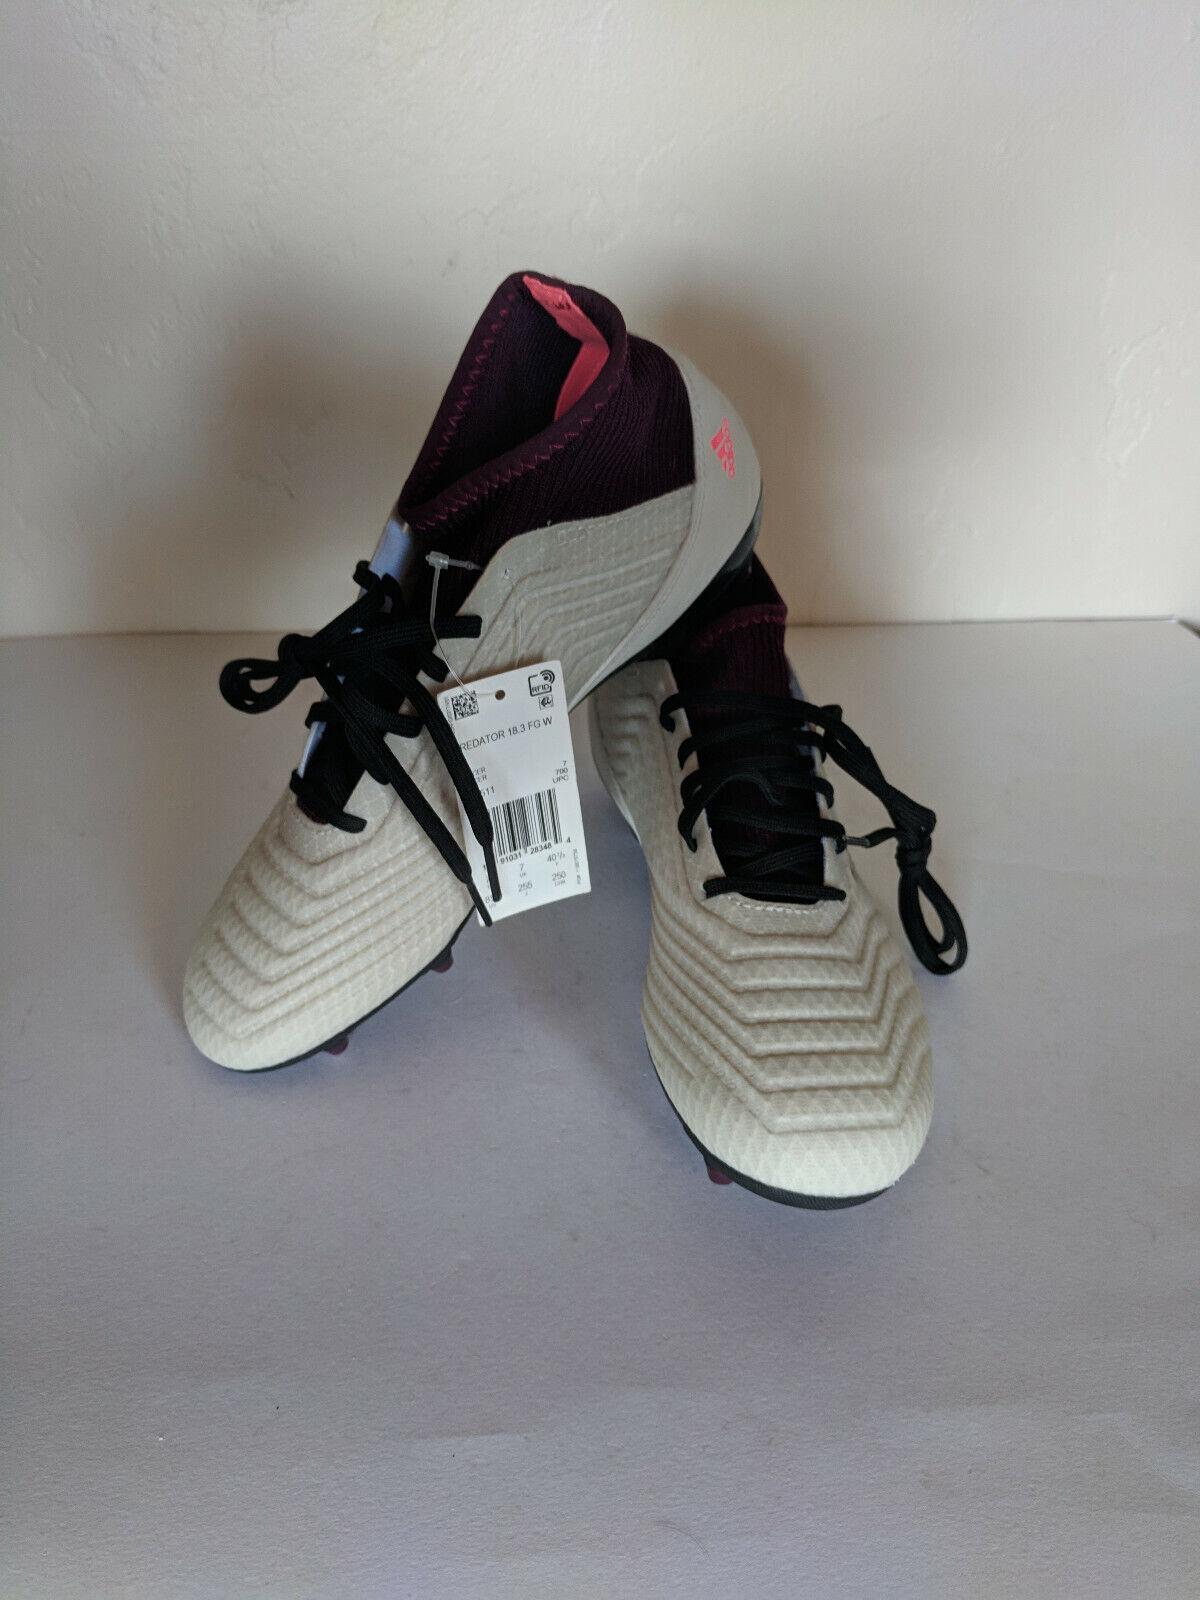 NEW adidas 18.3 Predator Soccer Cleats Women's 8.5 White Maroon DB2511